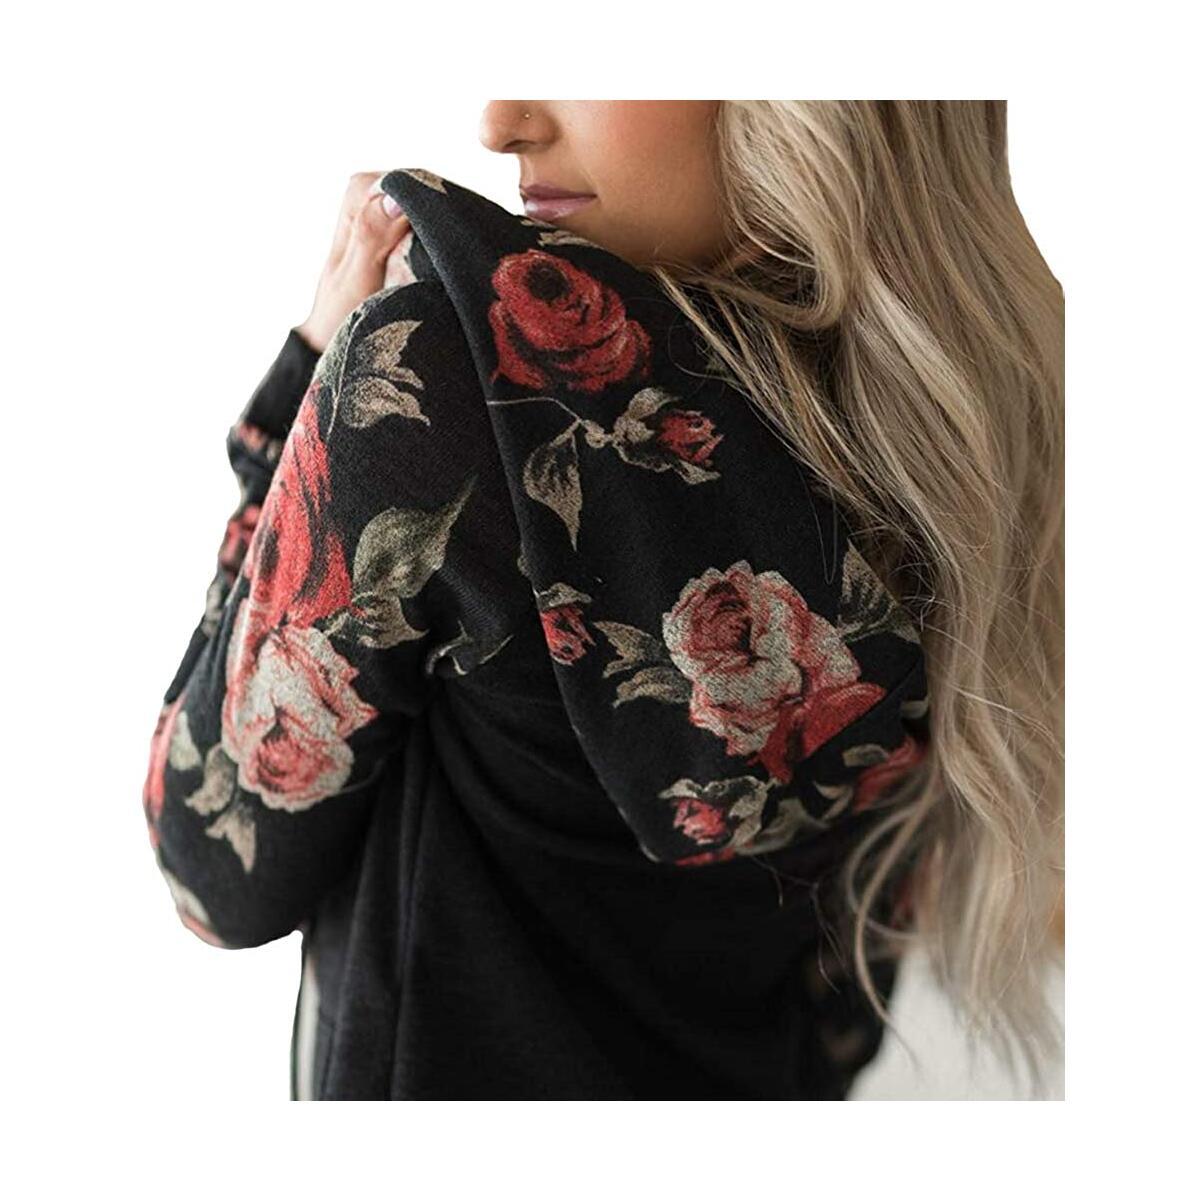 Minipeach Women's Pullover Long Sleeve Hoodies Coat Loose Casual Sweatshirts with Pocket Black